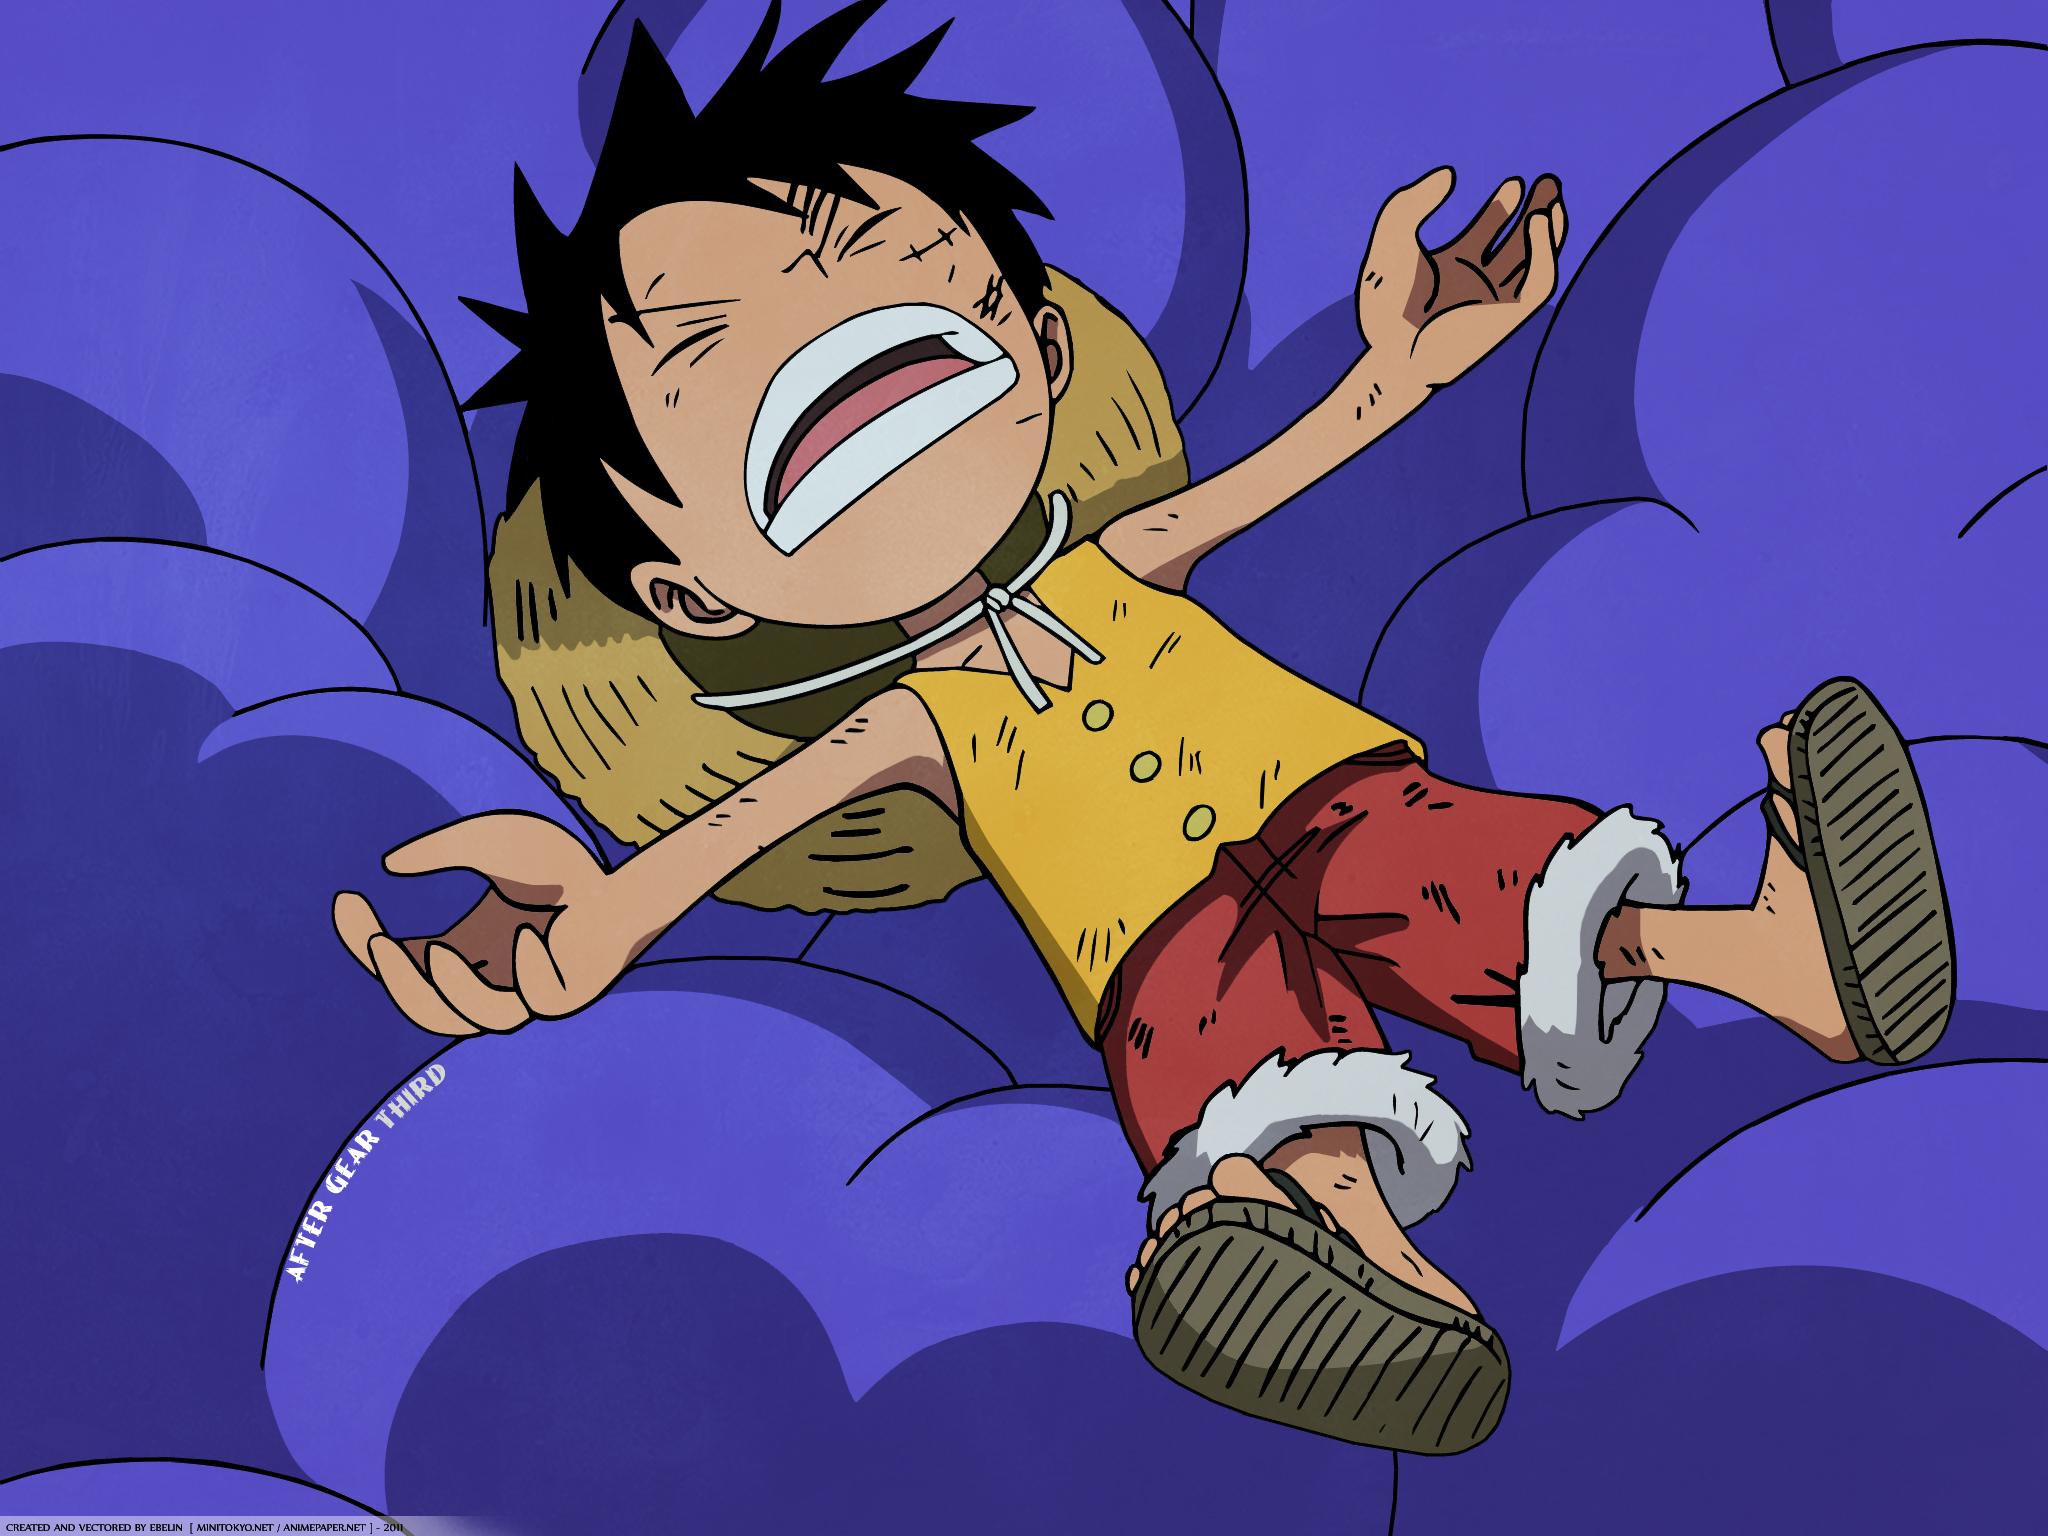 Eiichiro Oda Toei Animation One Piece Monkey D Luffy Wallpaper